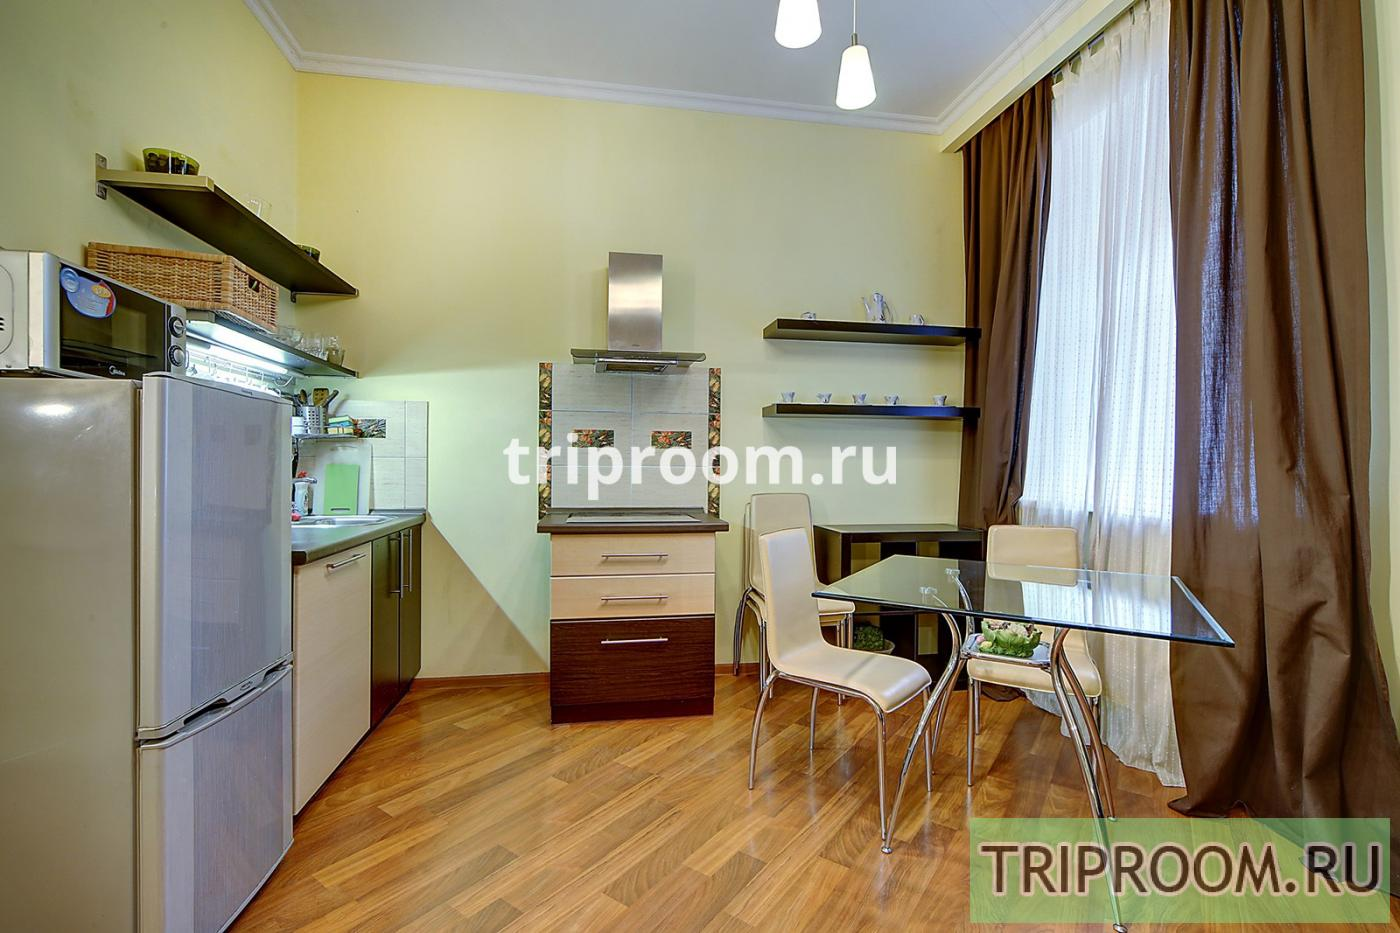 1-комнатная квартира посуточно (вариант № 15117), ул. Канала Грибоедова набережная, фото № 8